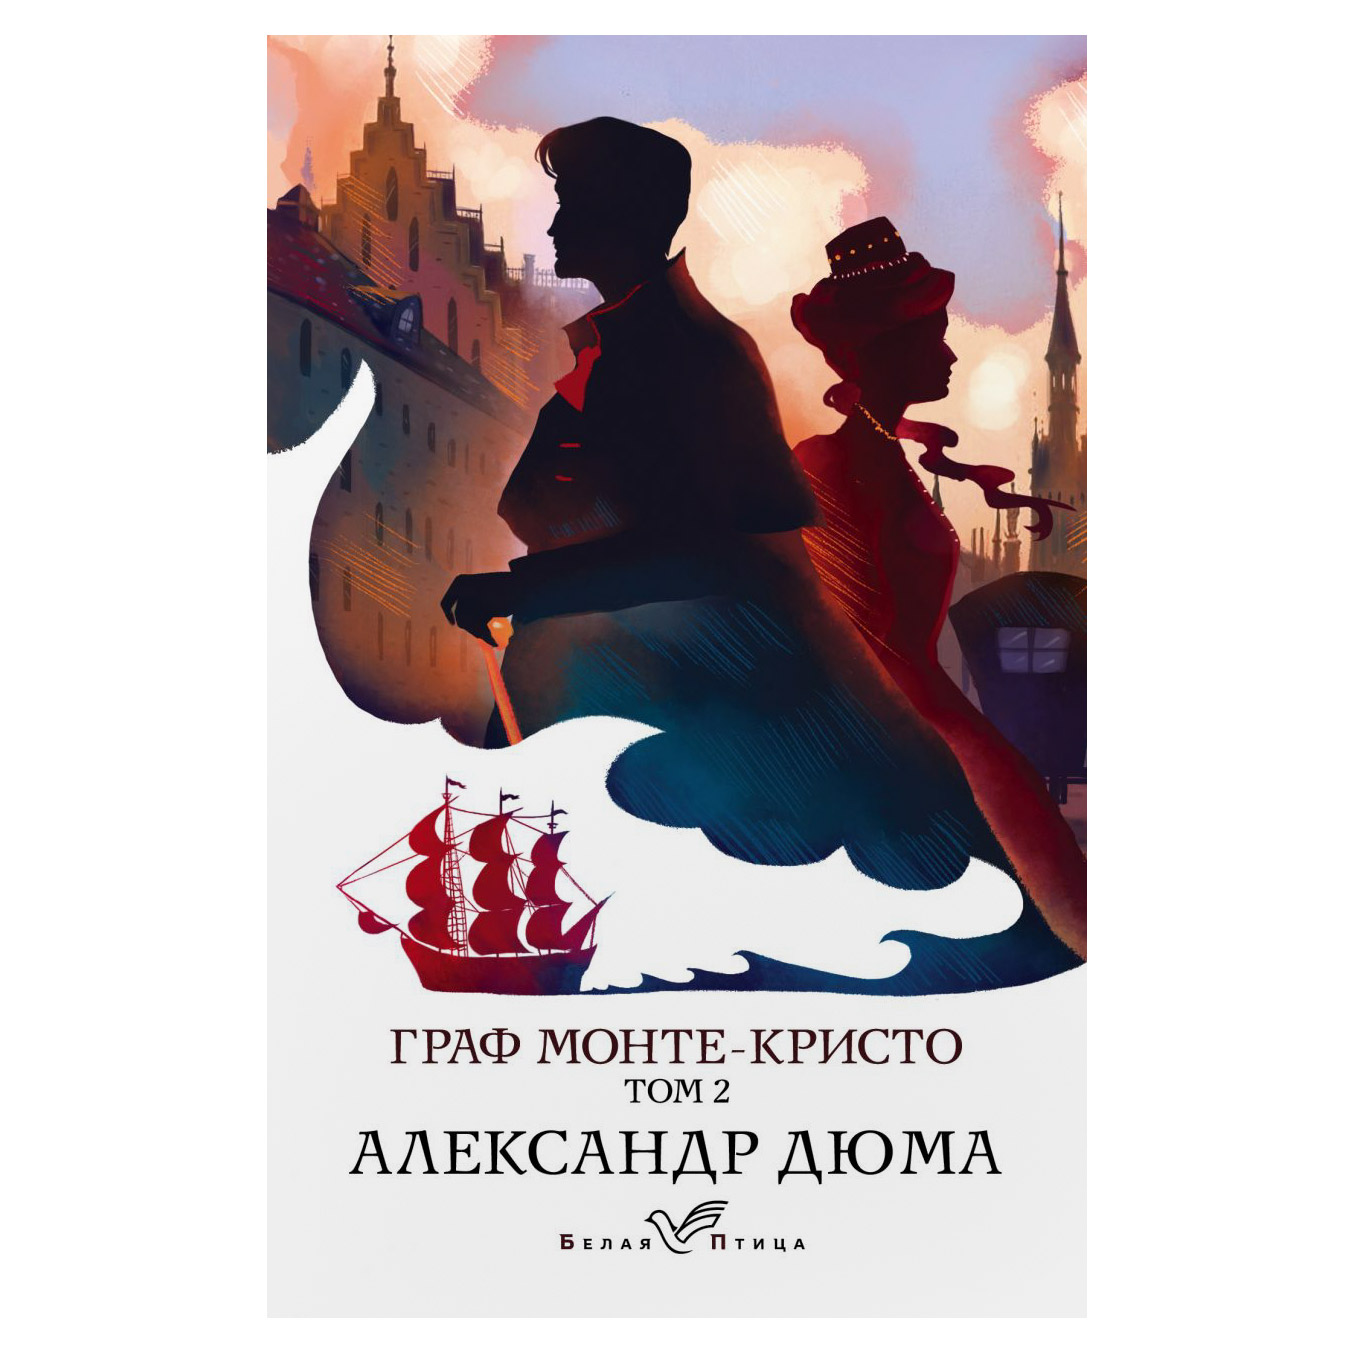 Книга Эксмо Граф Монте-Кристо том 2. Александр Дюма